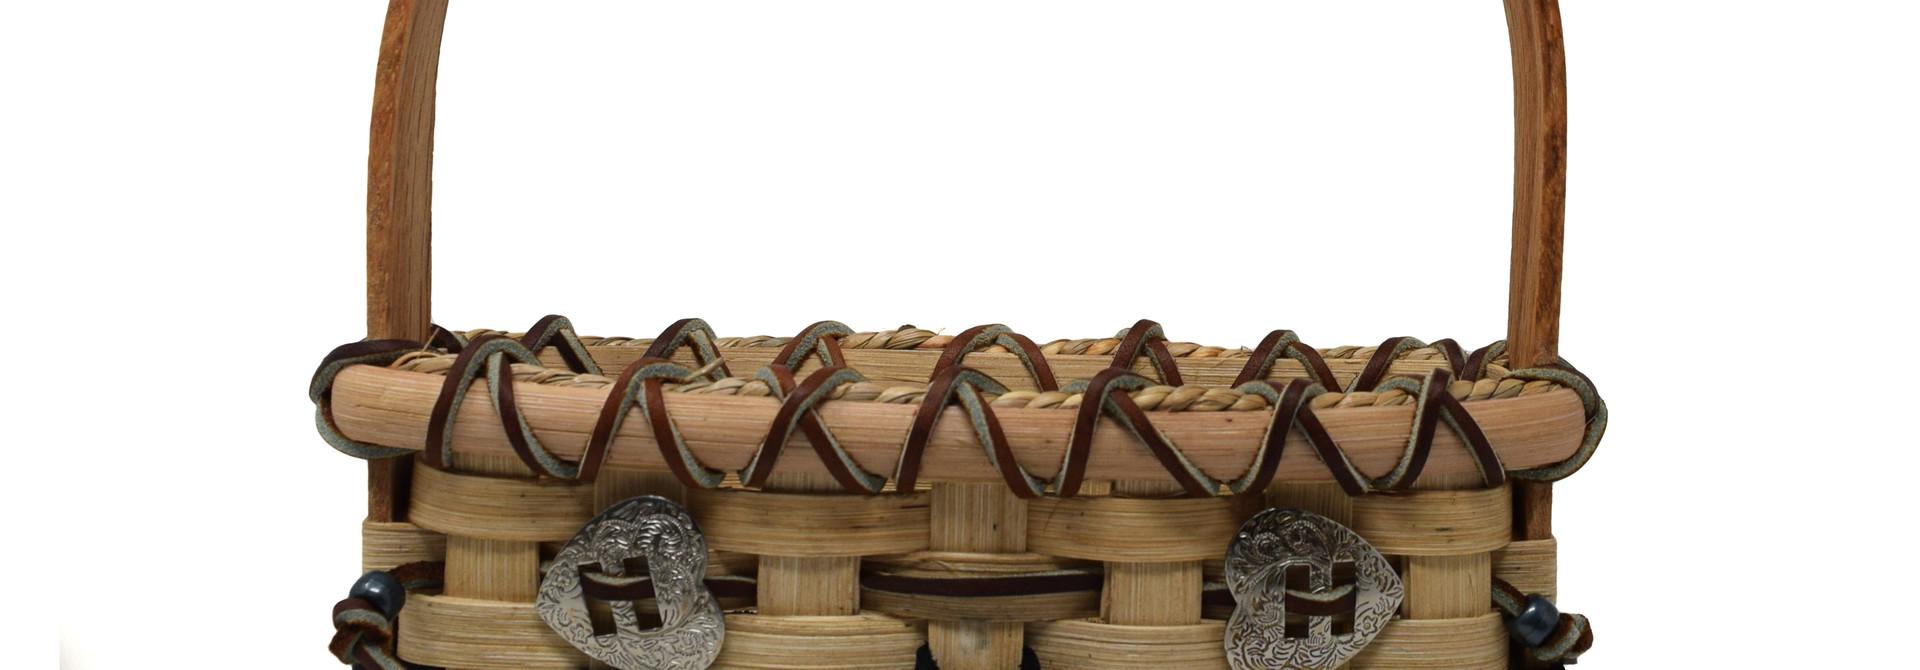 Horse Lover's Key/Peg Basket